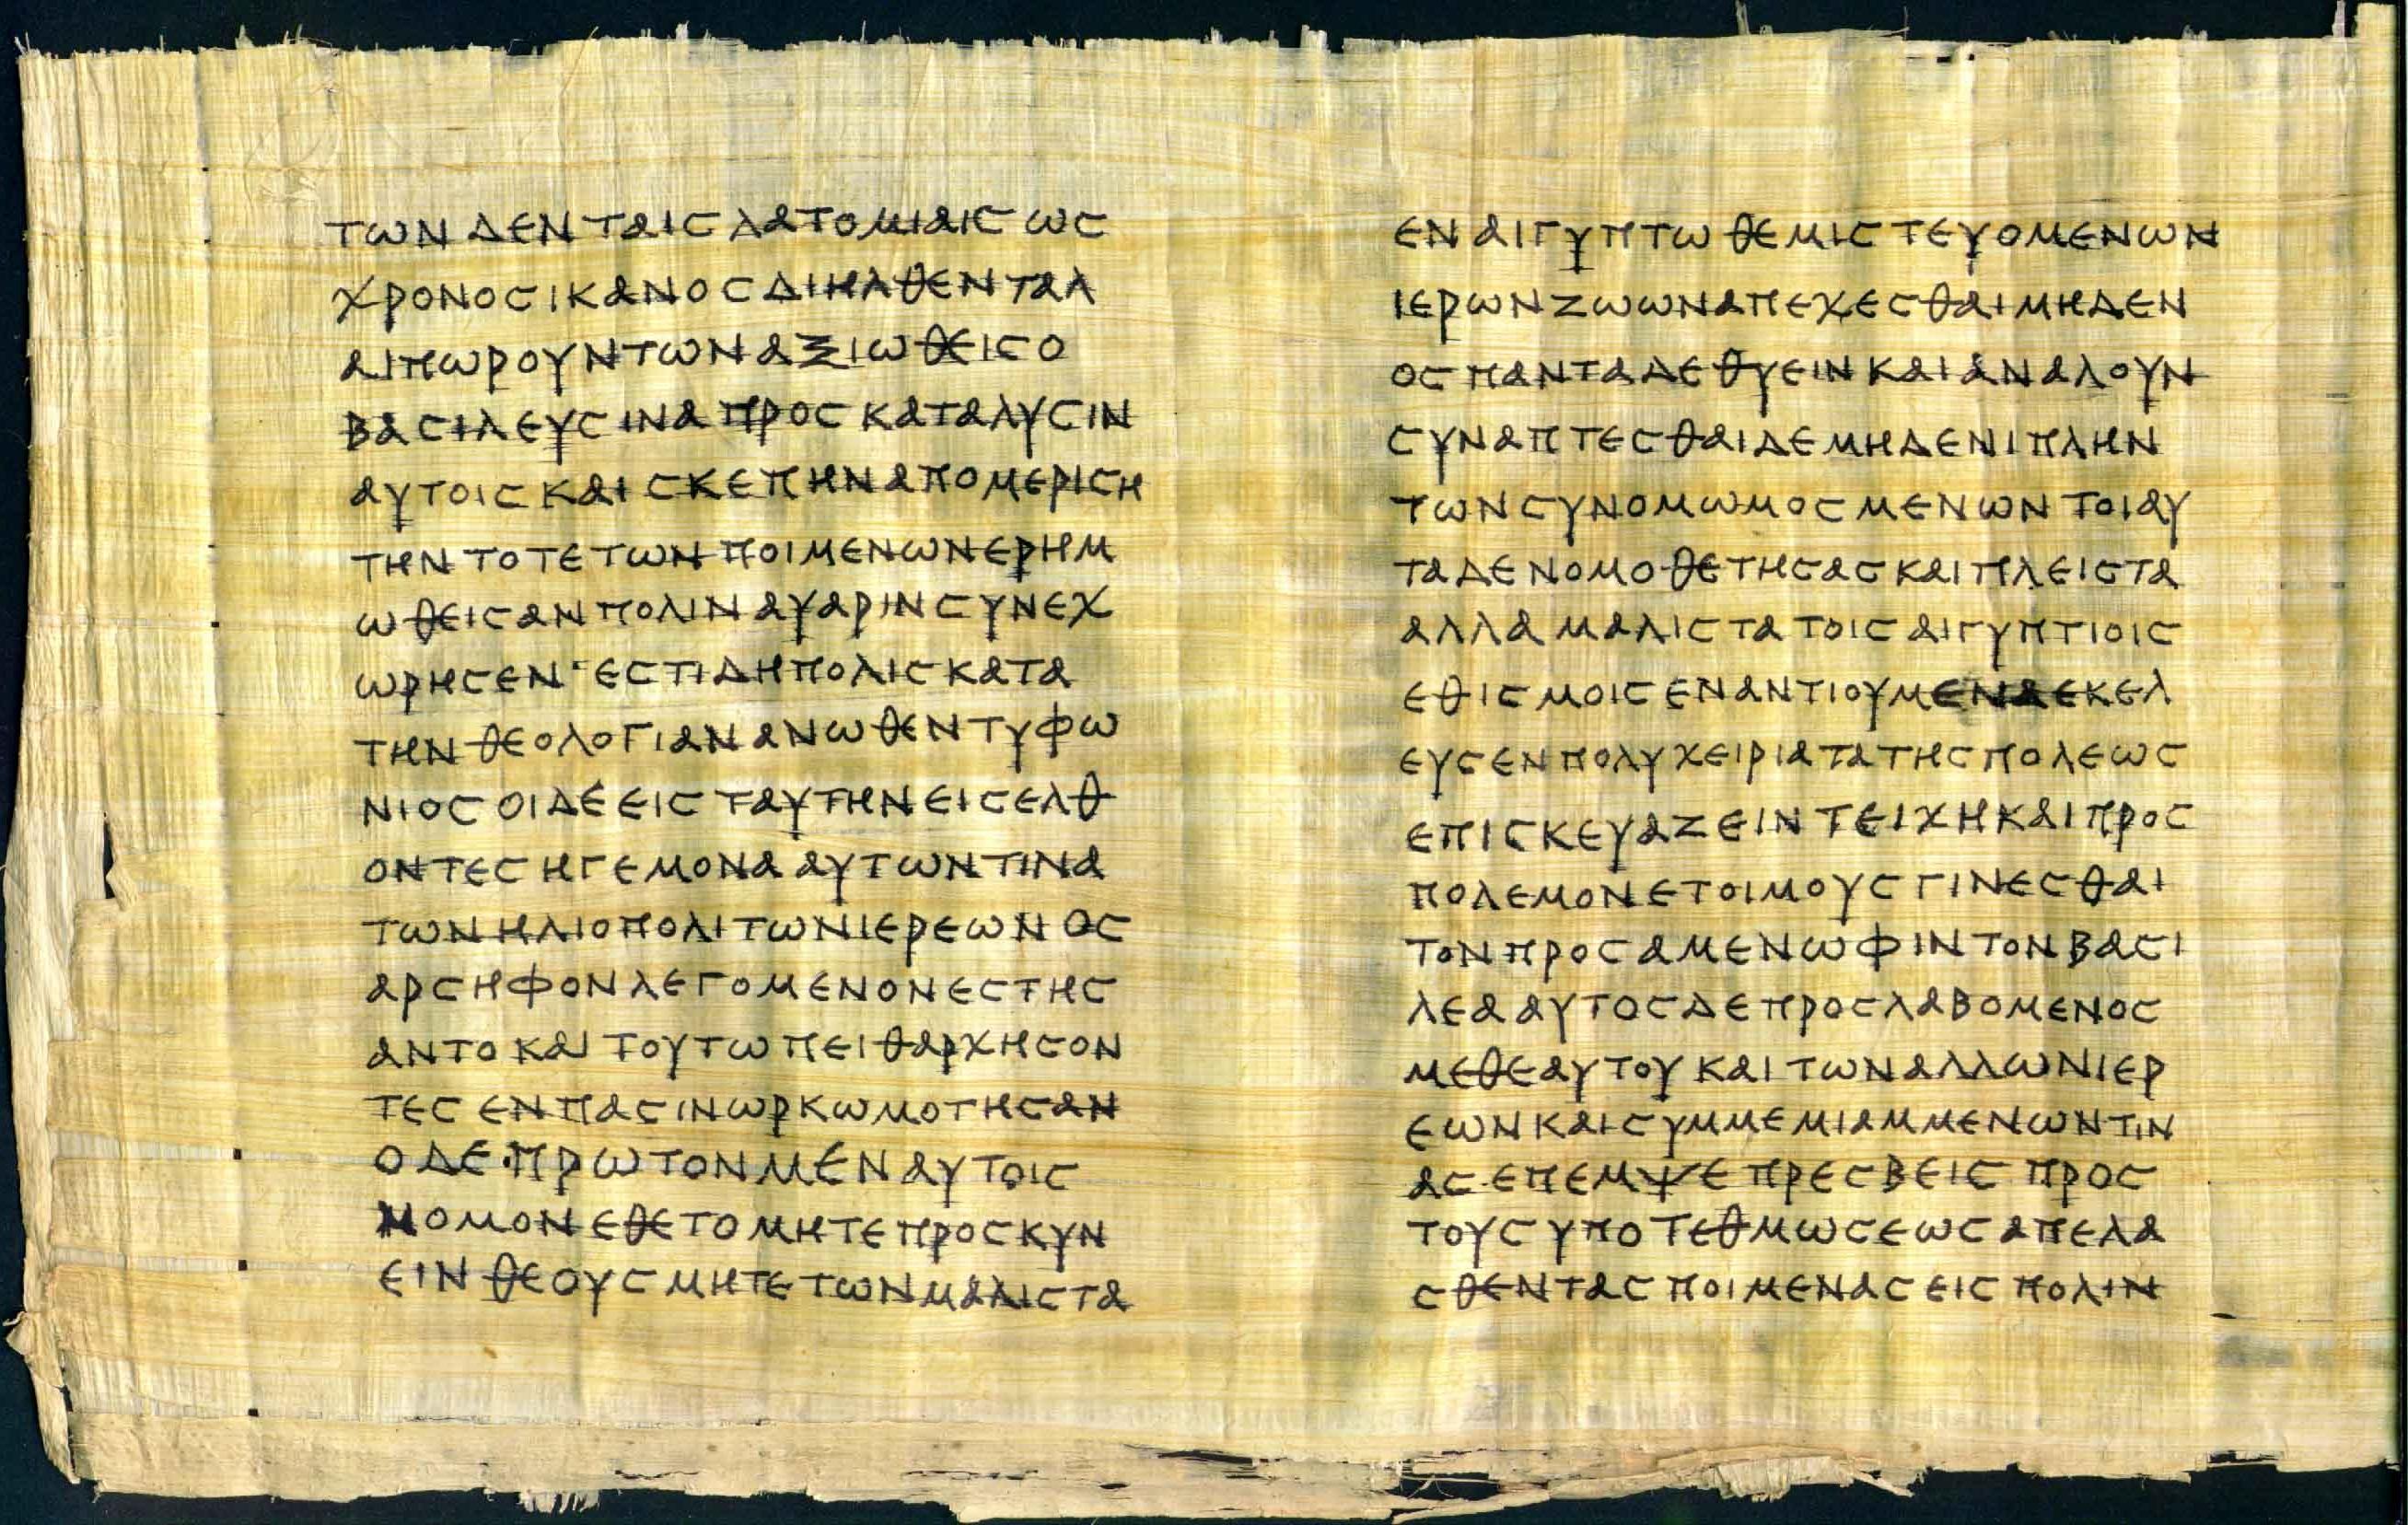 King james 1611 bible